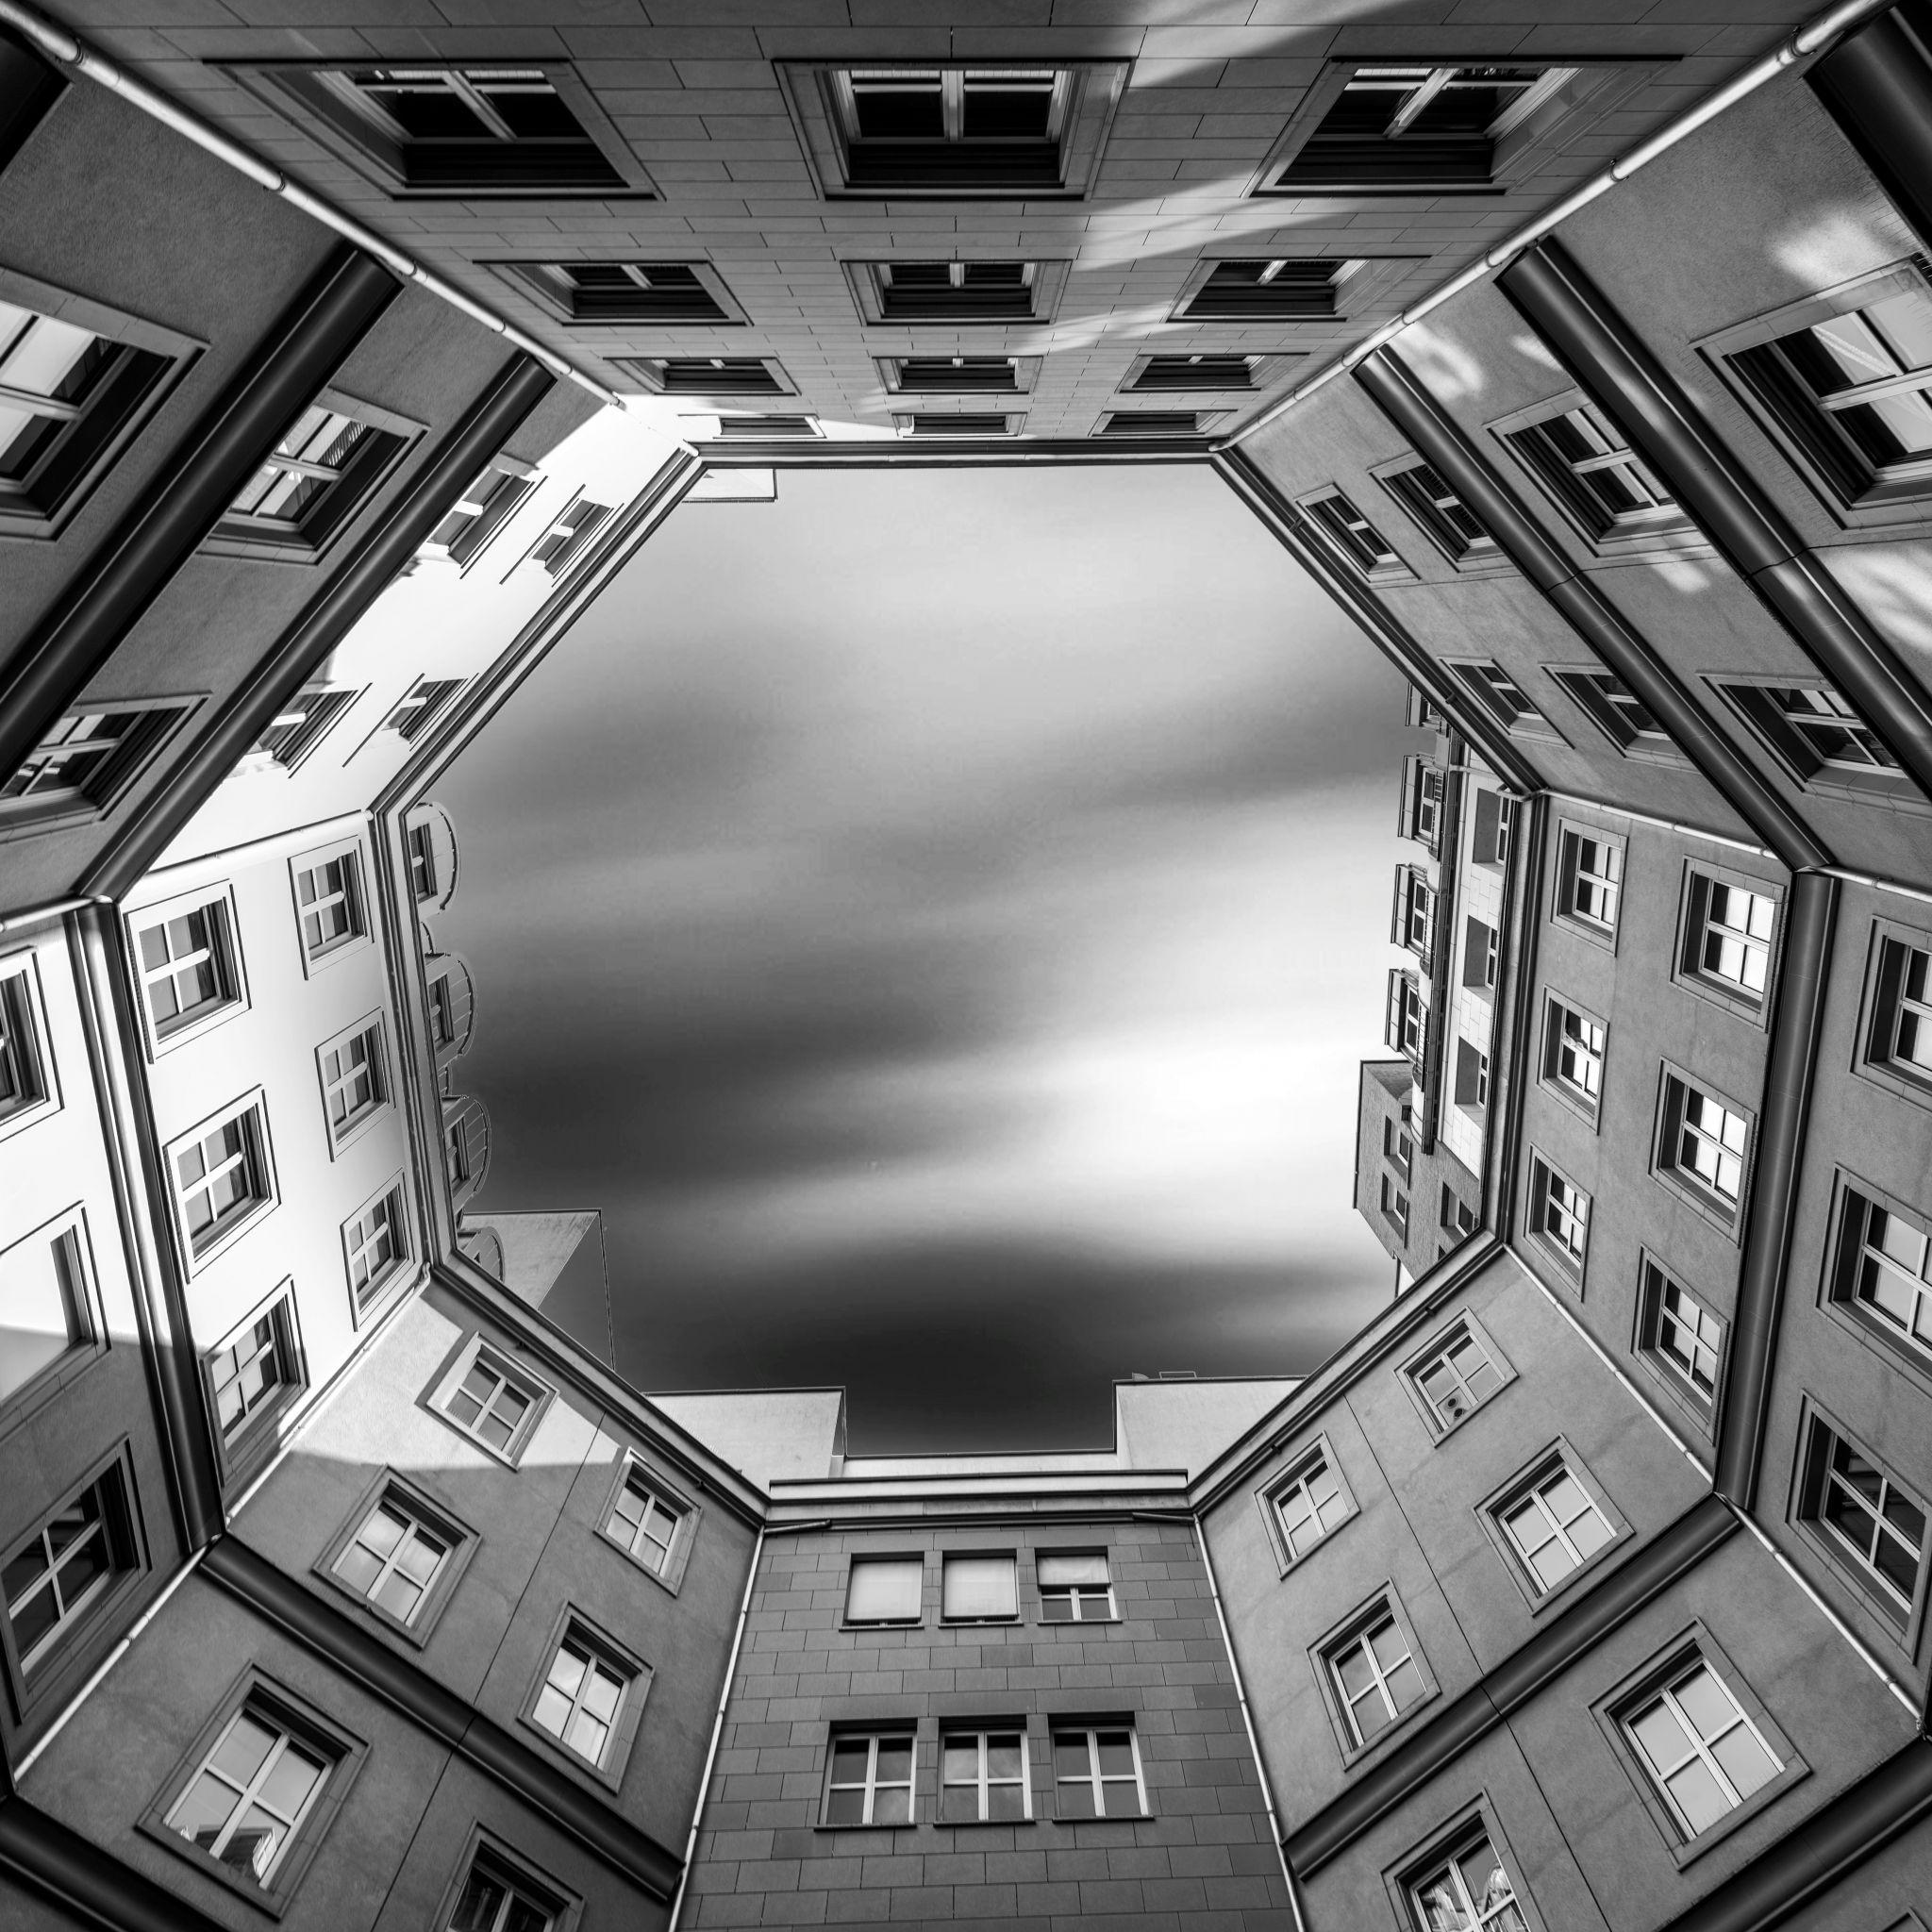 Octagonal Palace, Germany